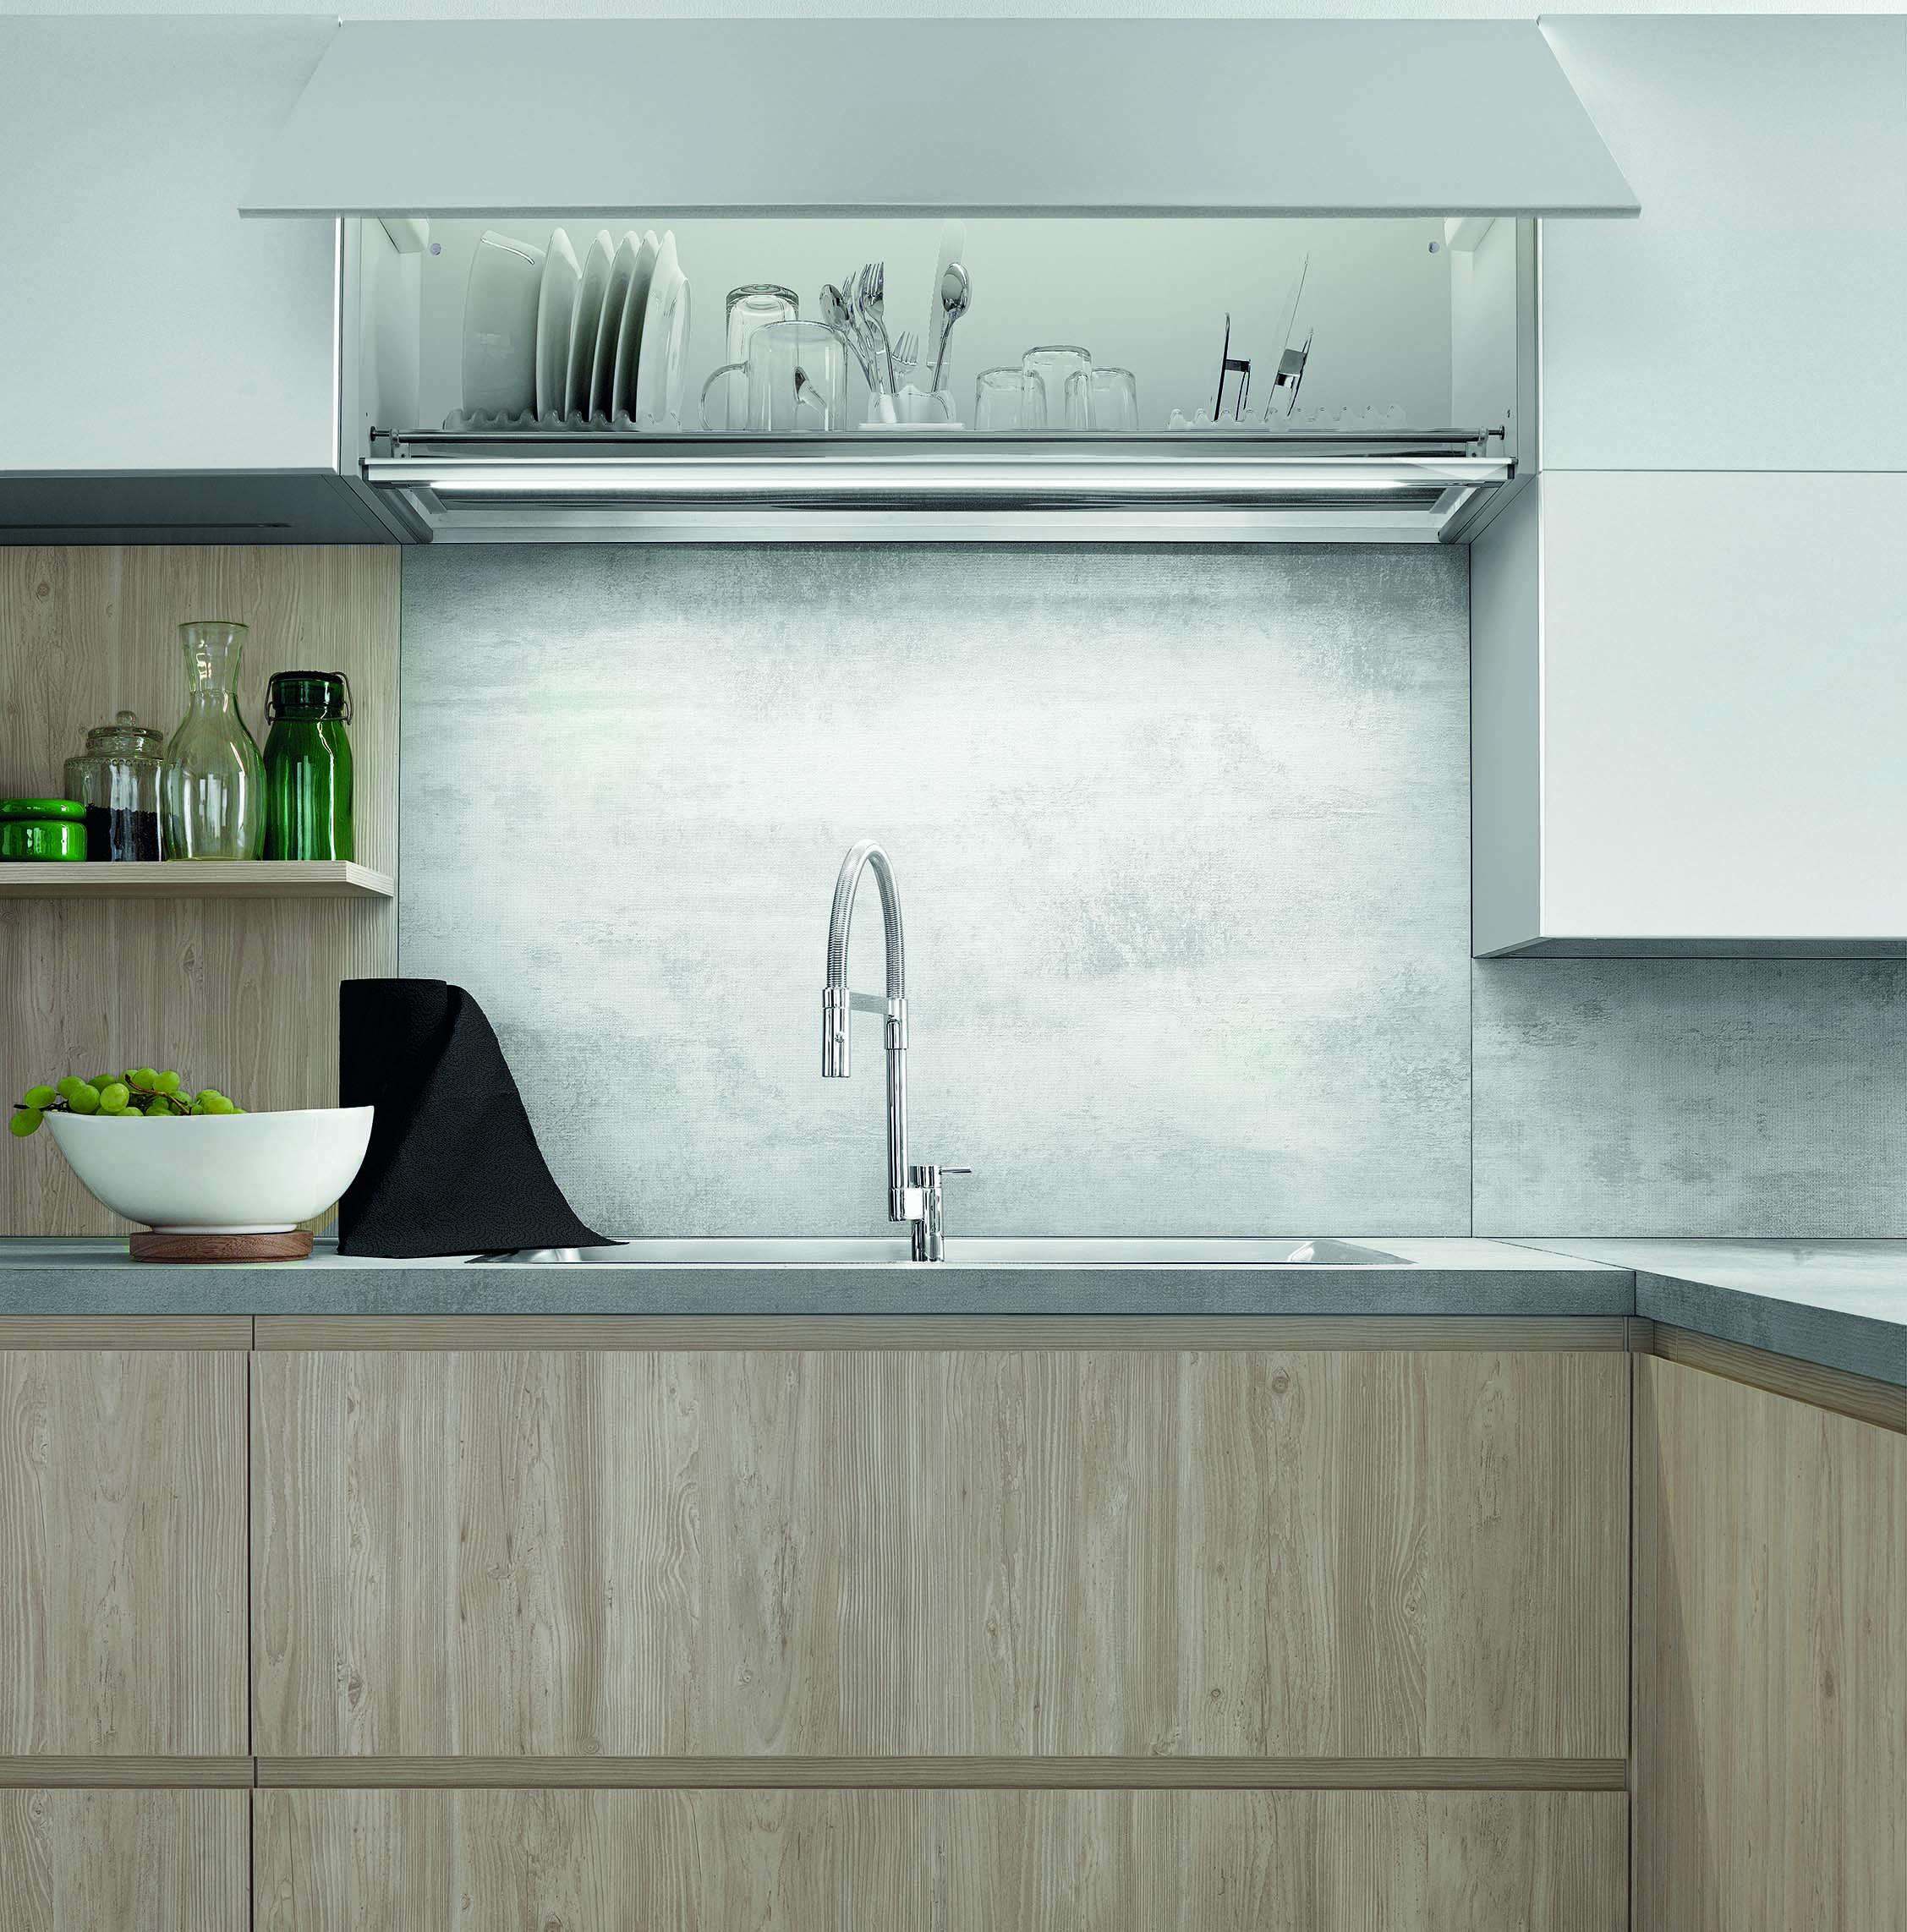 Aria Casa Kitchens